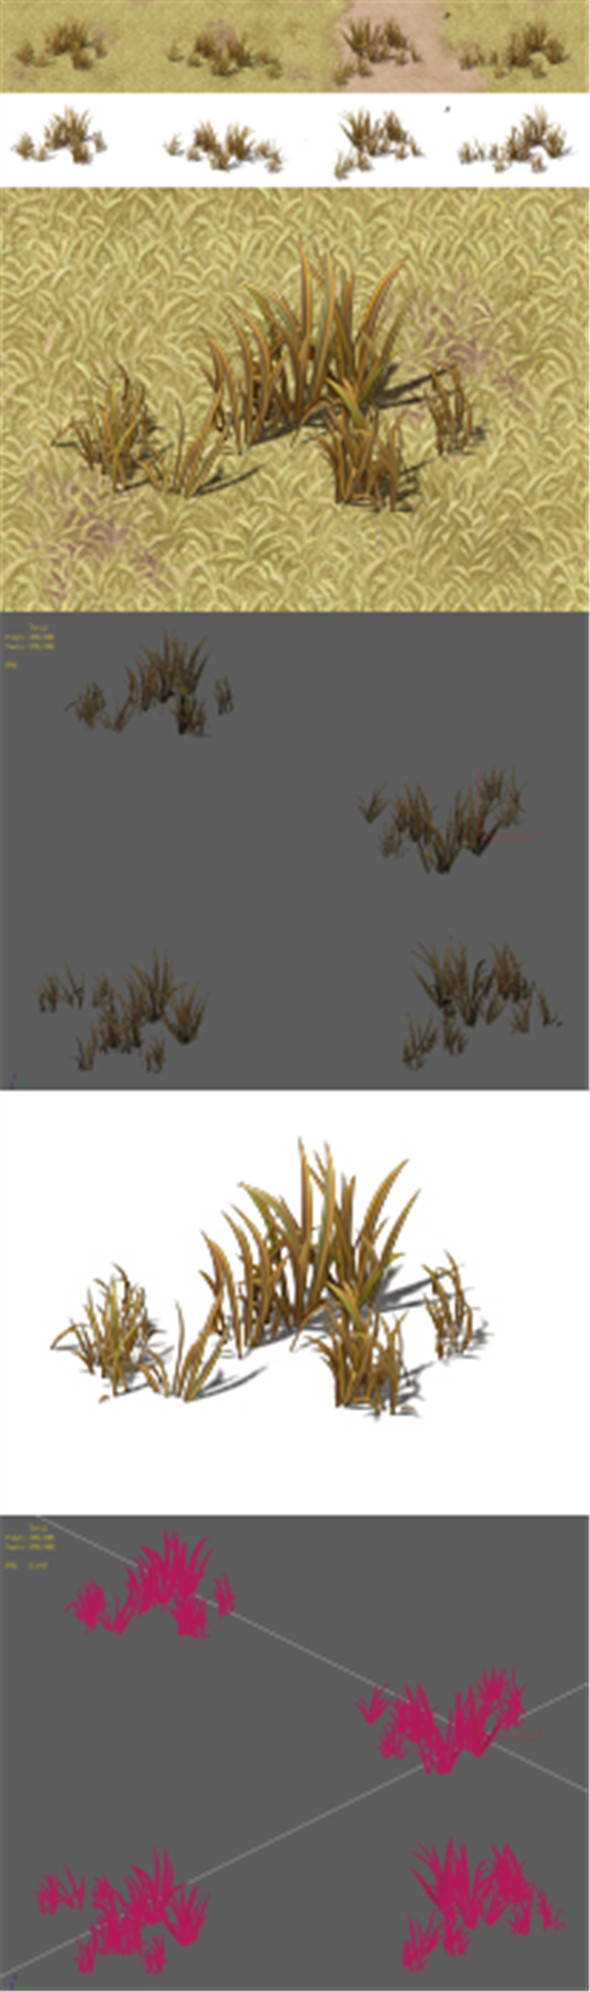 Cartoon Edition - Wildland Vegetation - 3DOcean Item for Sale